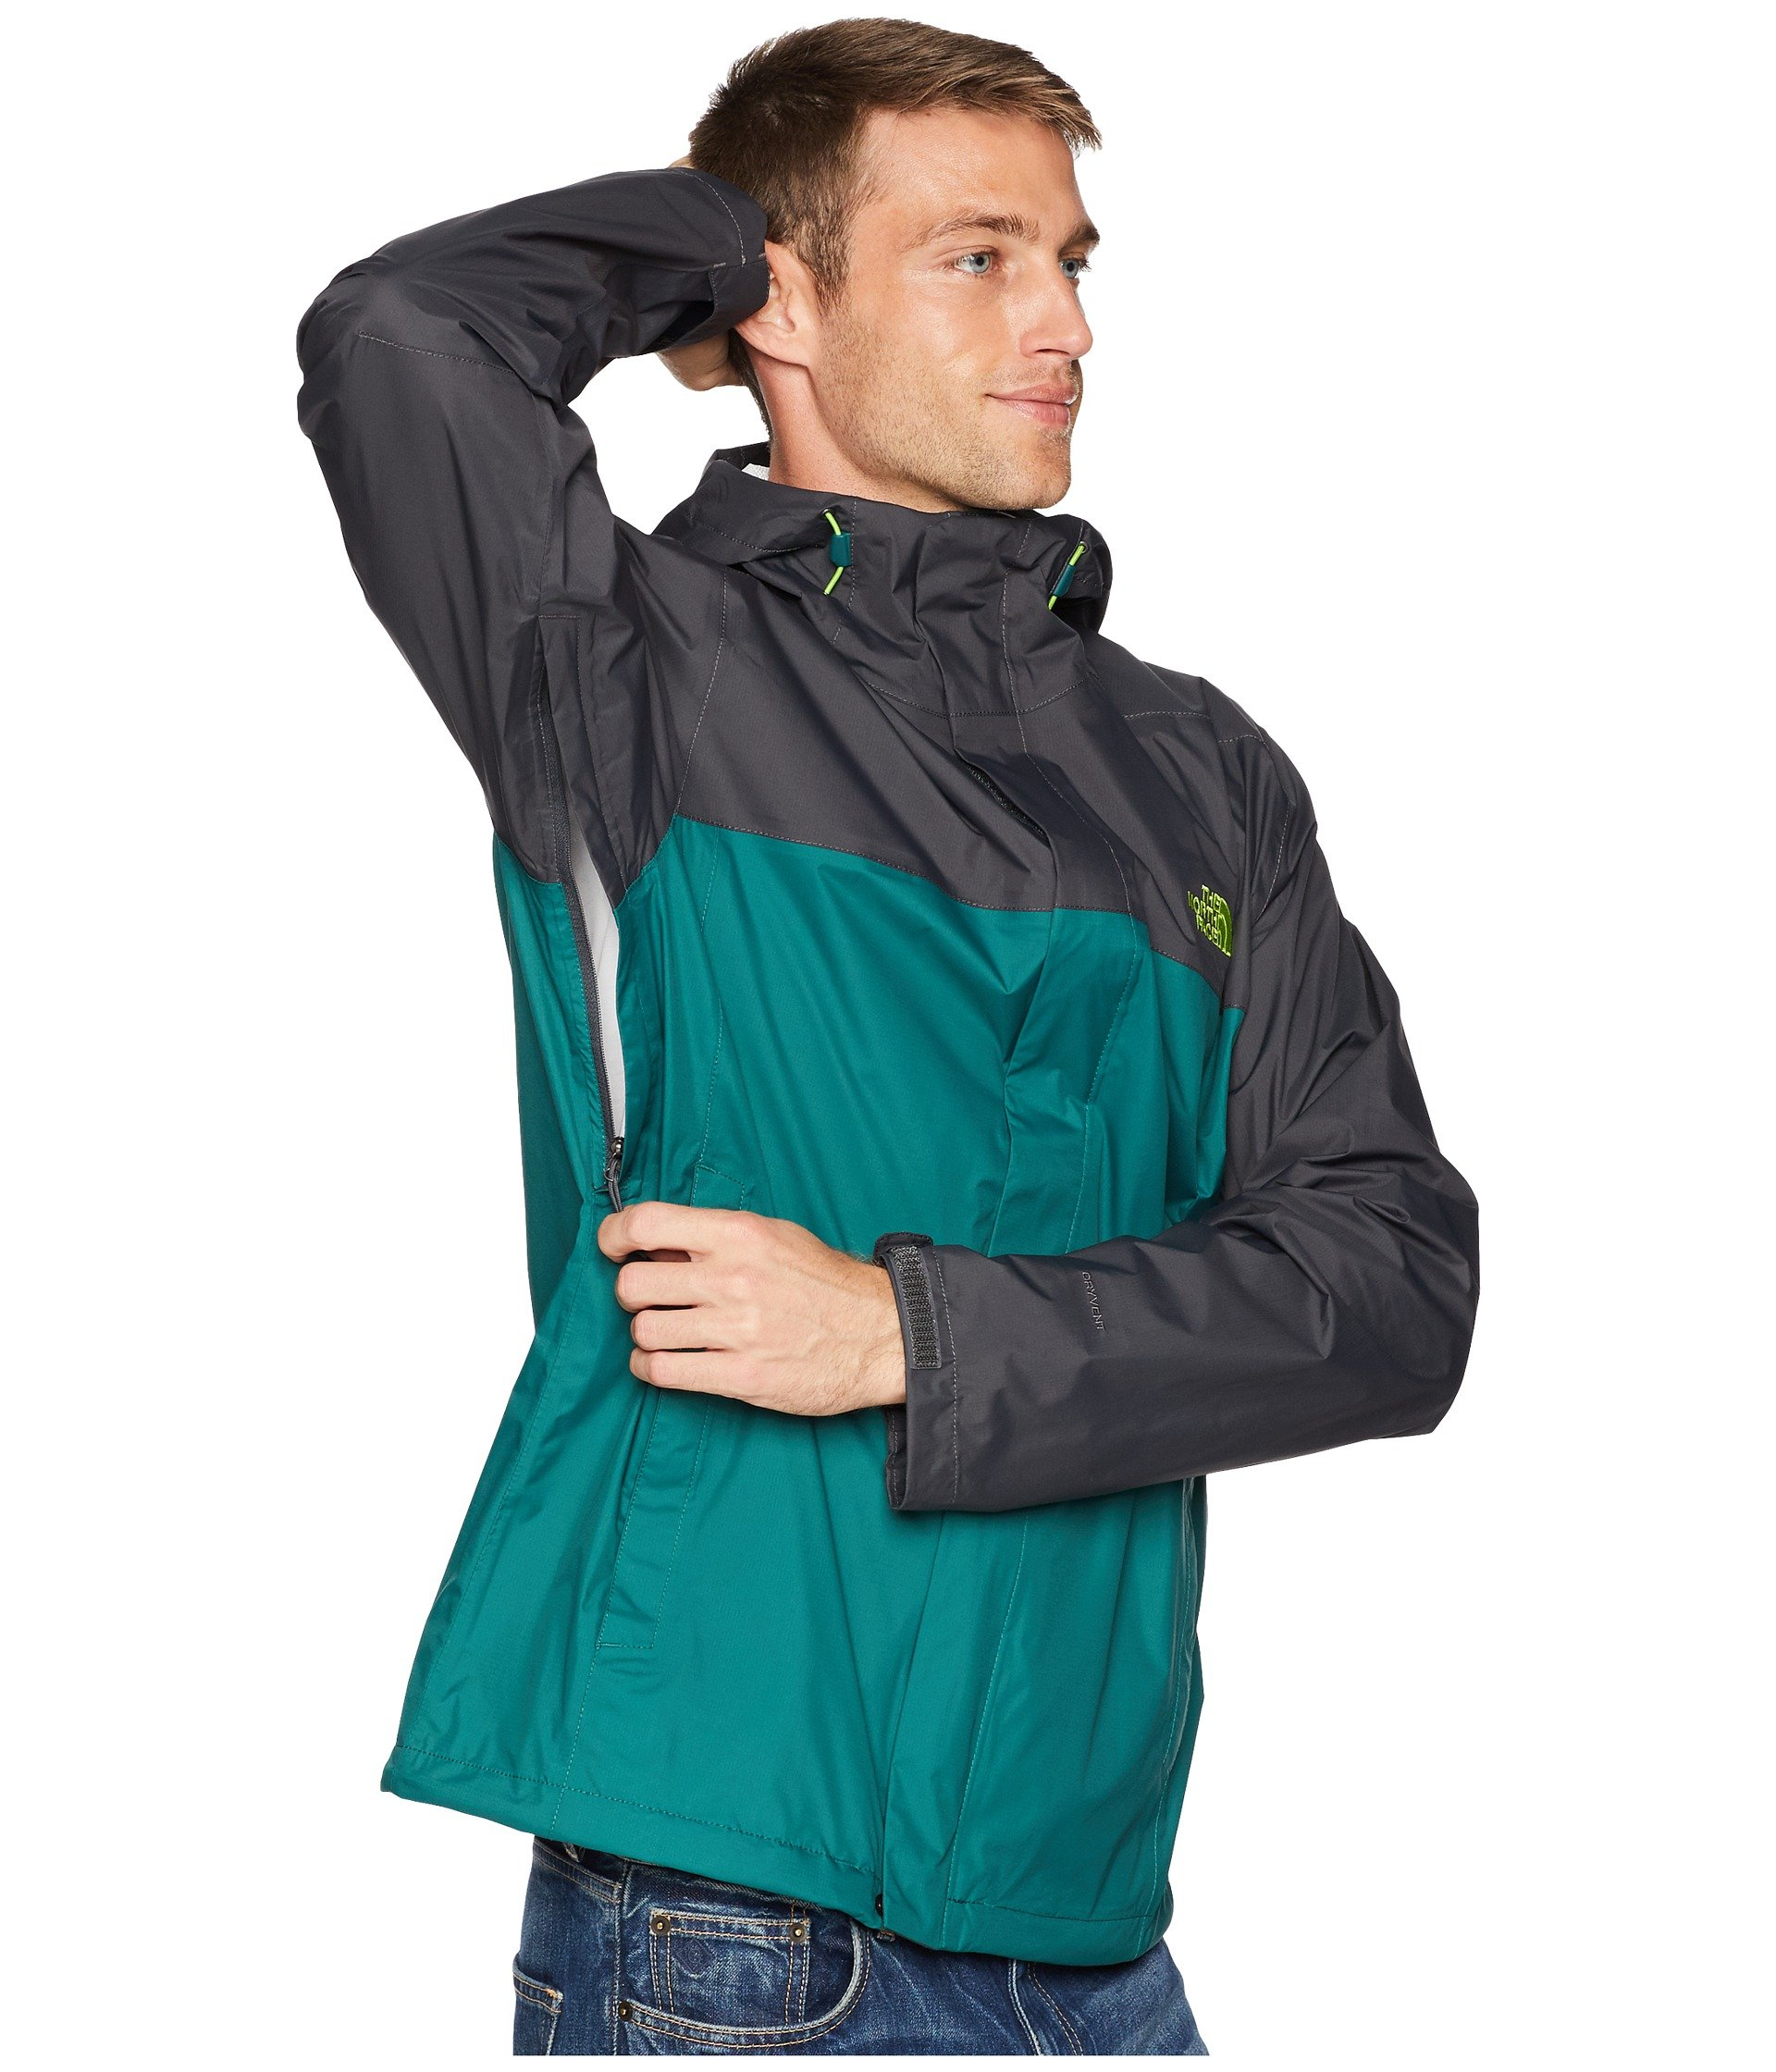 Garden North Venture Jacket Asphalt 2 botanical Green Face Grey The 8vwxUqf1U